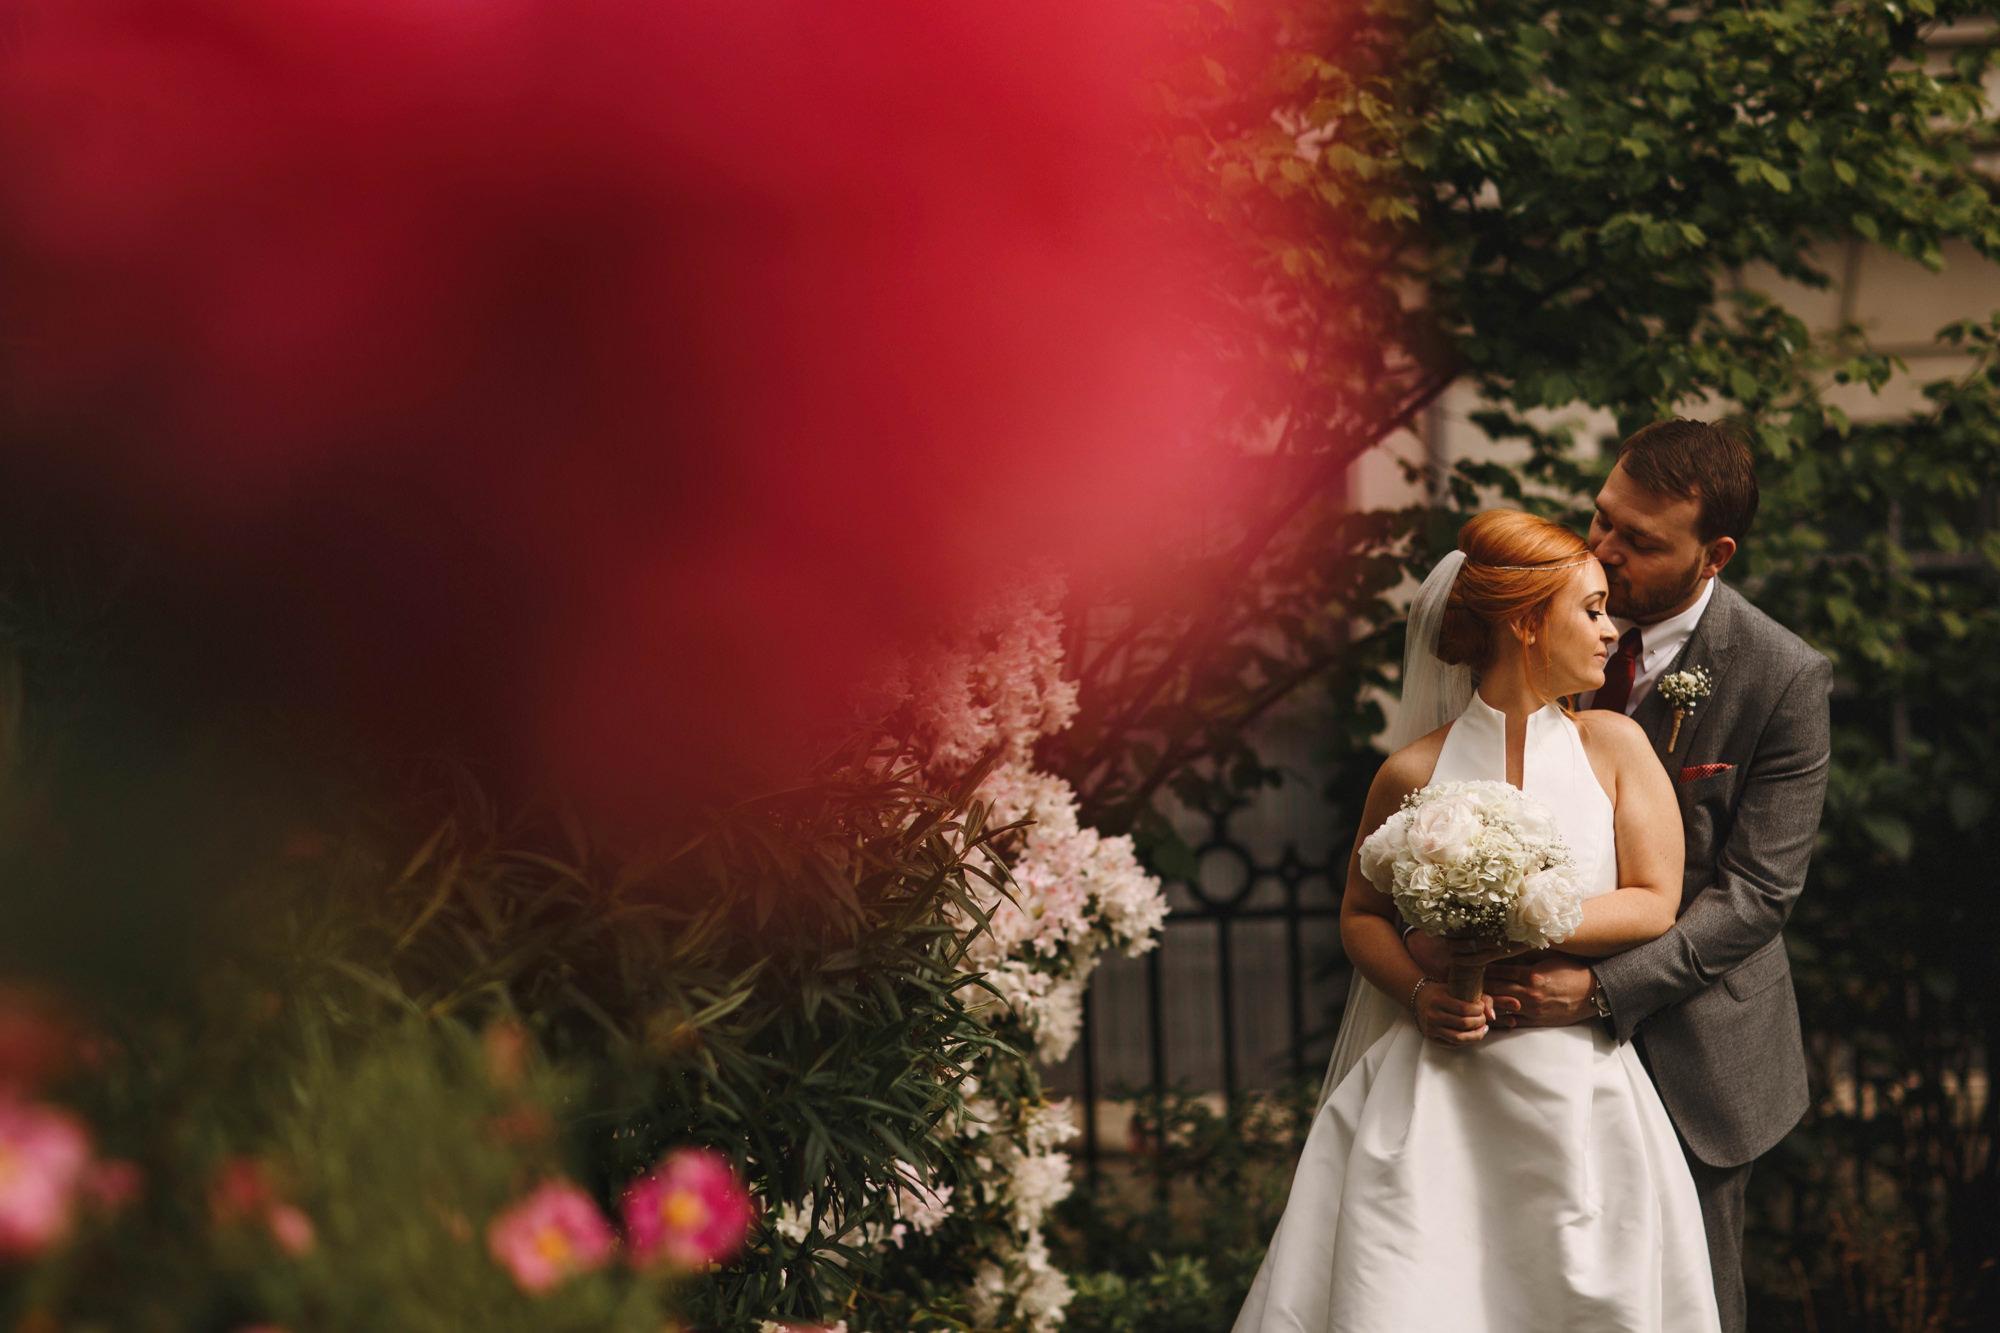 Ohmeohmy liverpool wedding 35